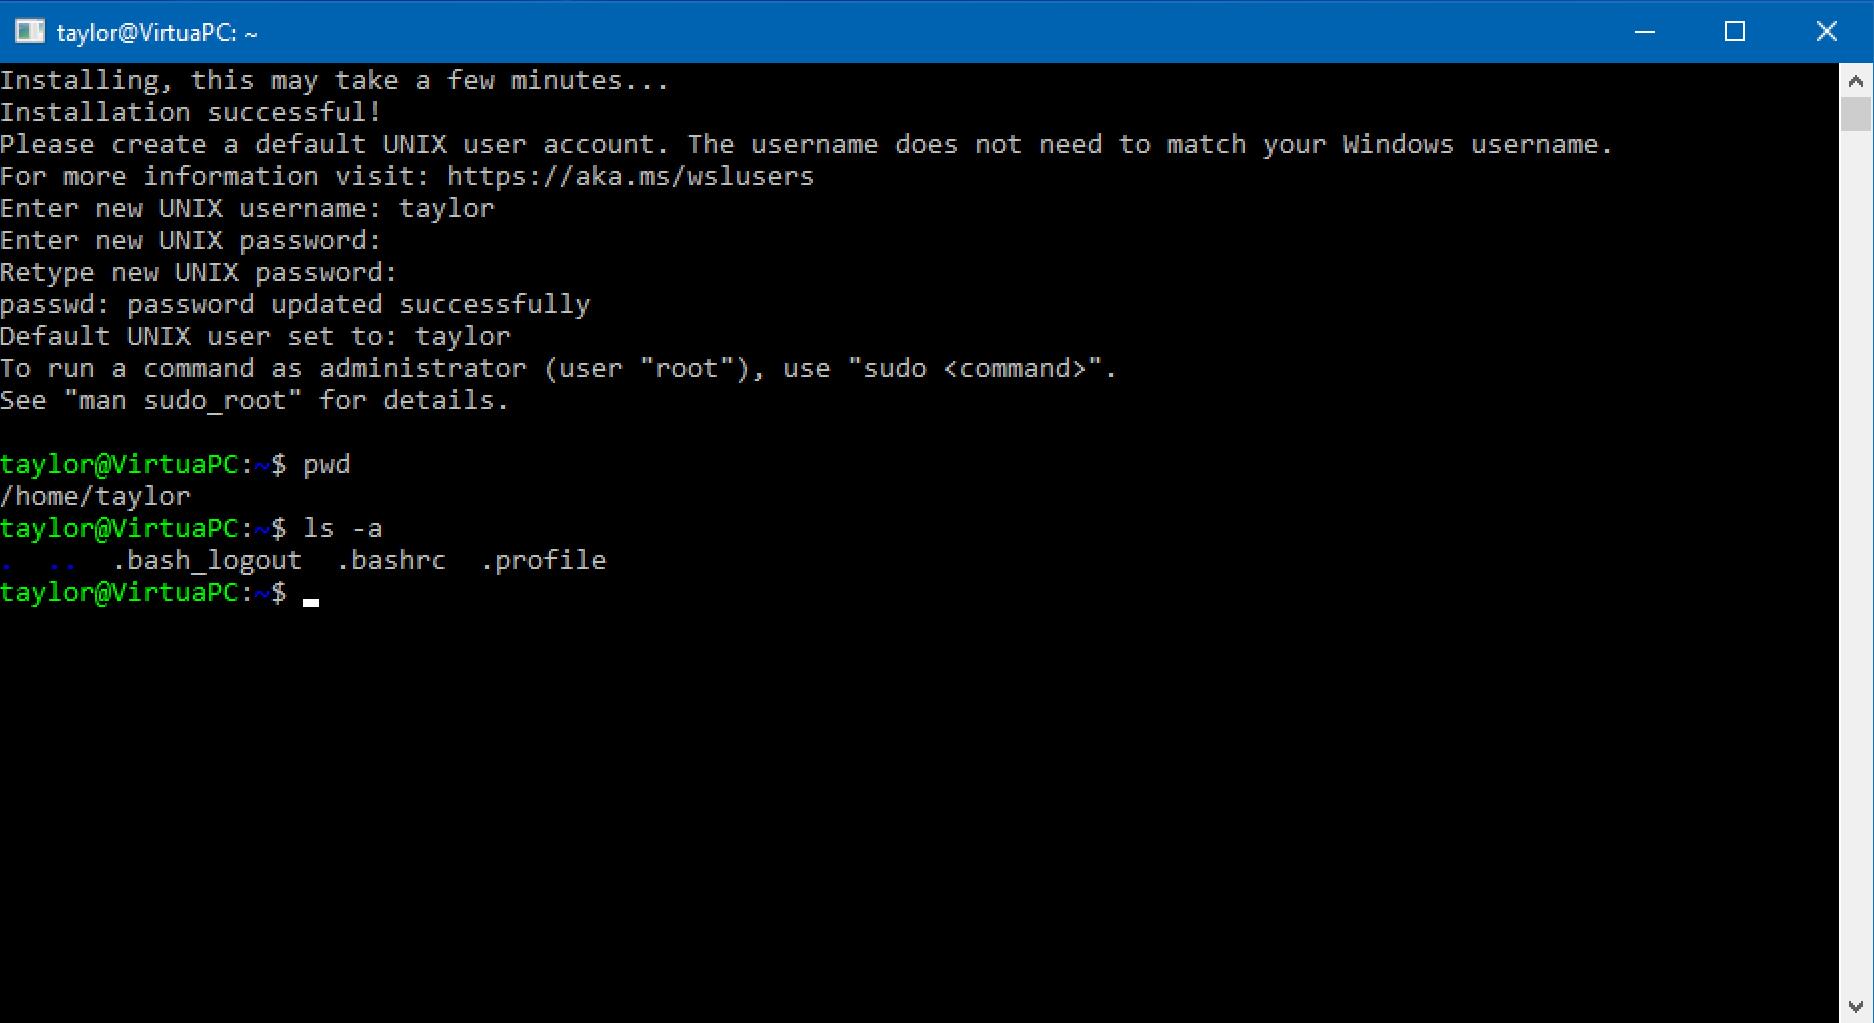 linux ubuntu setup done win10 windows